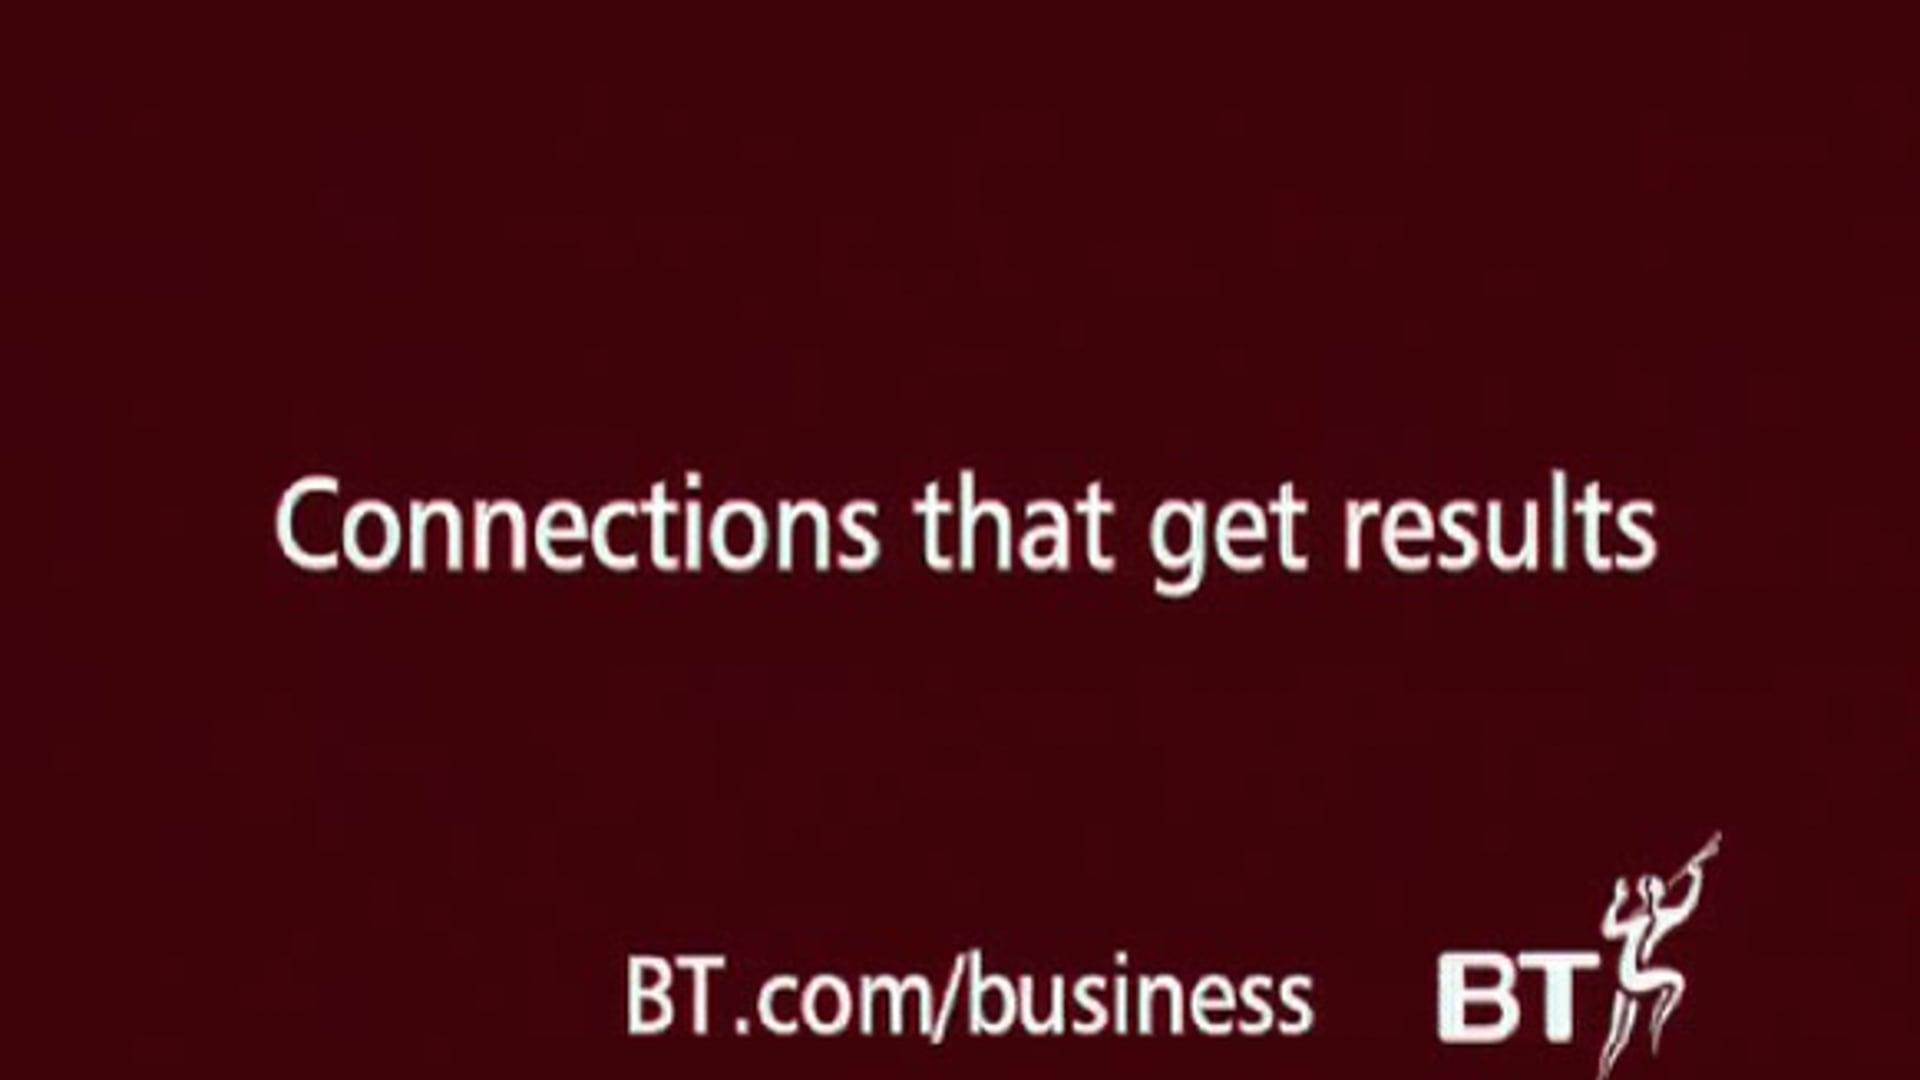 BT - Business - Shanghai